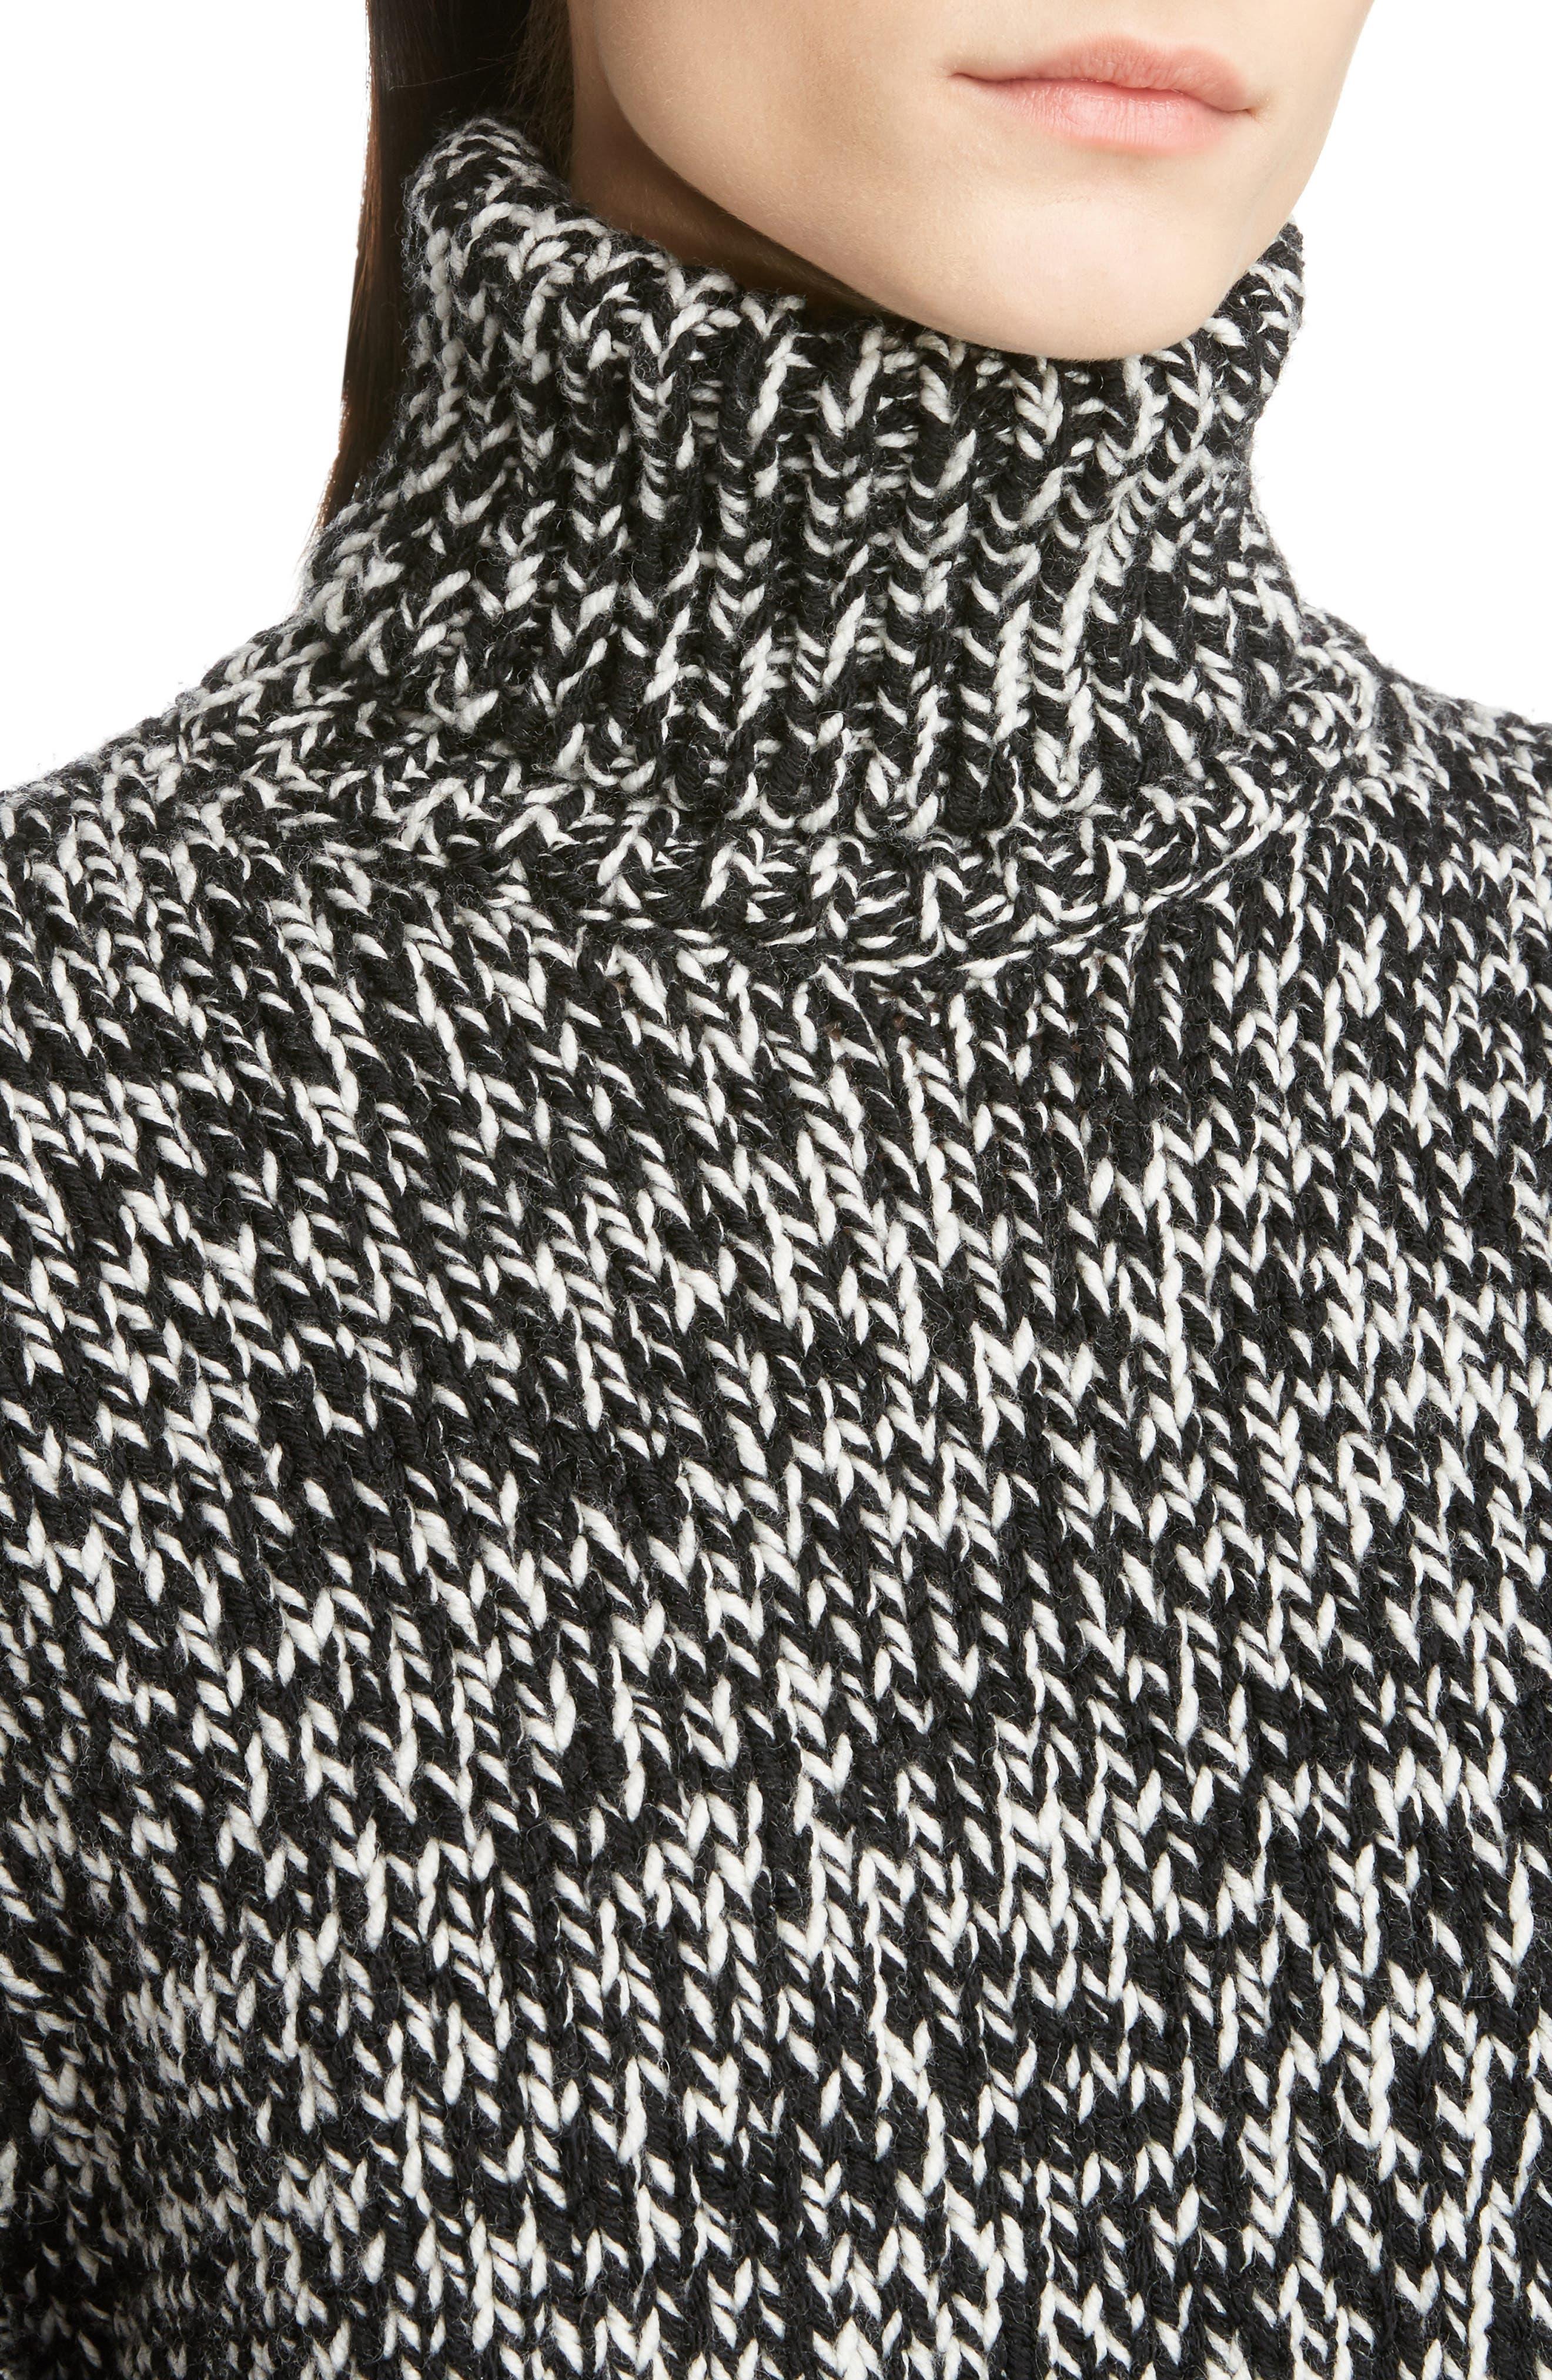 Mélange Knit Wool Turtleneck Sweater,                             Alternate thumbnail 4, color,                             Natural/ Black